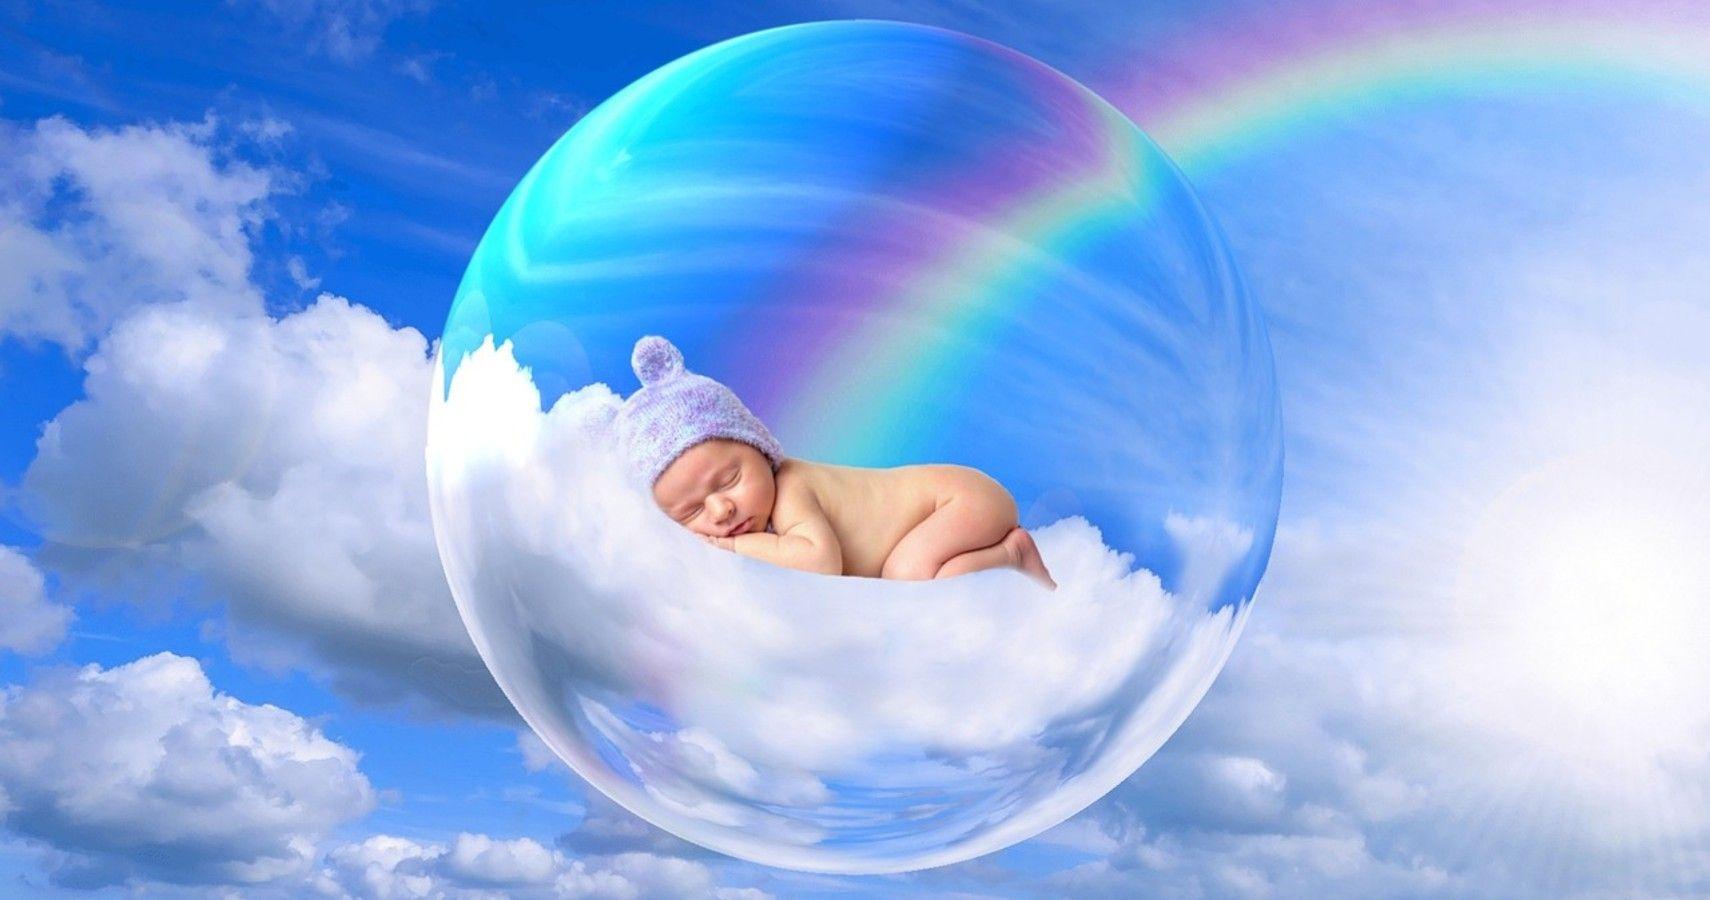 Baby Boy Born Inside An Intact Amniotic Sac Via C-Section